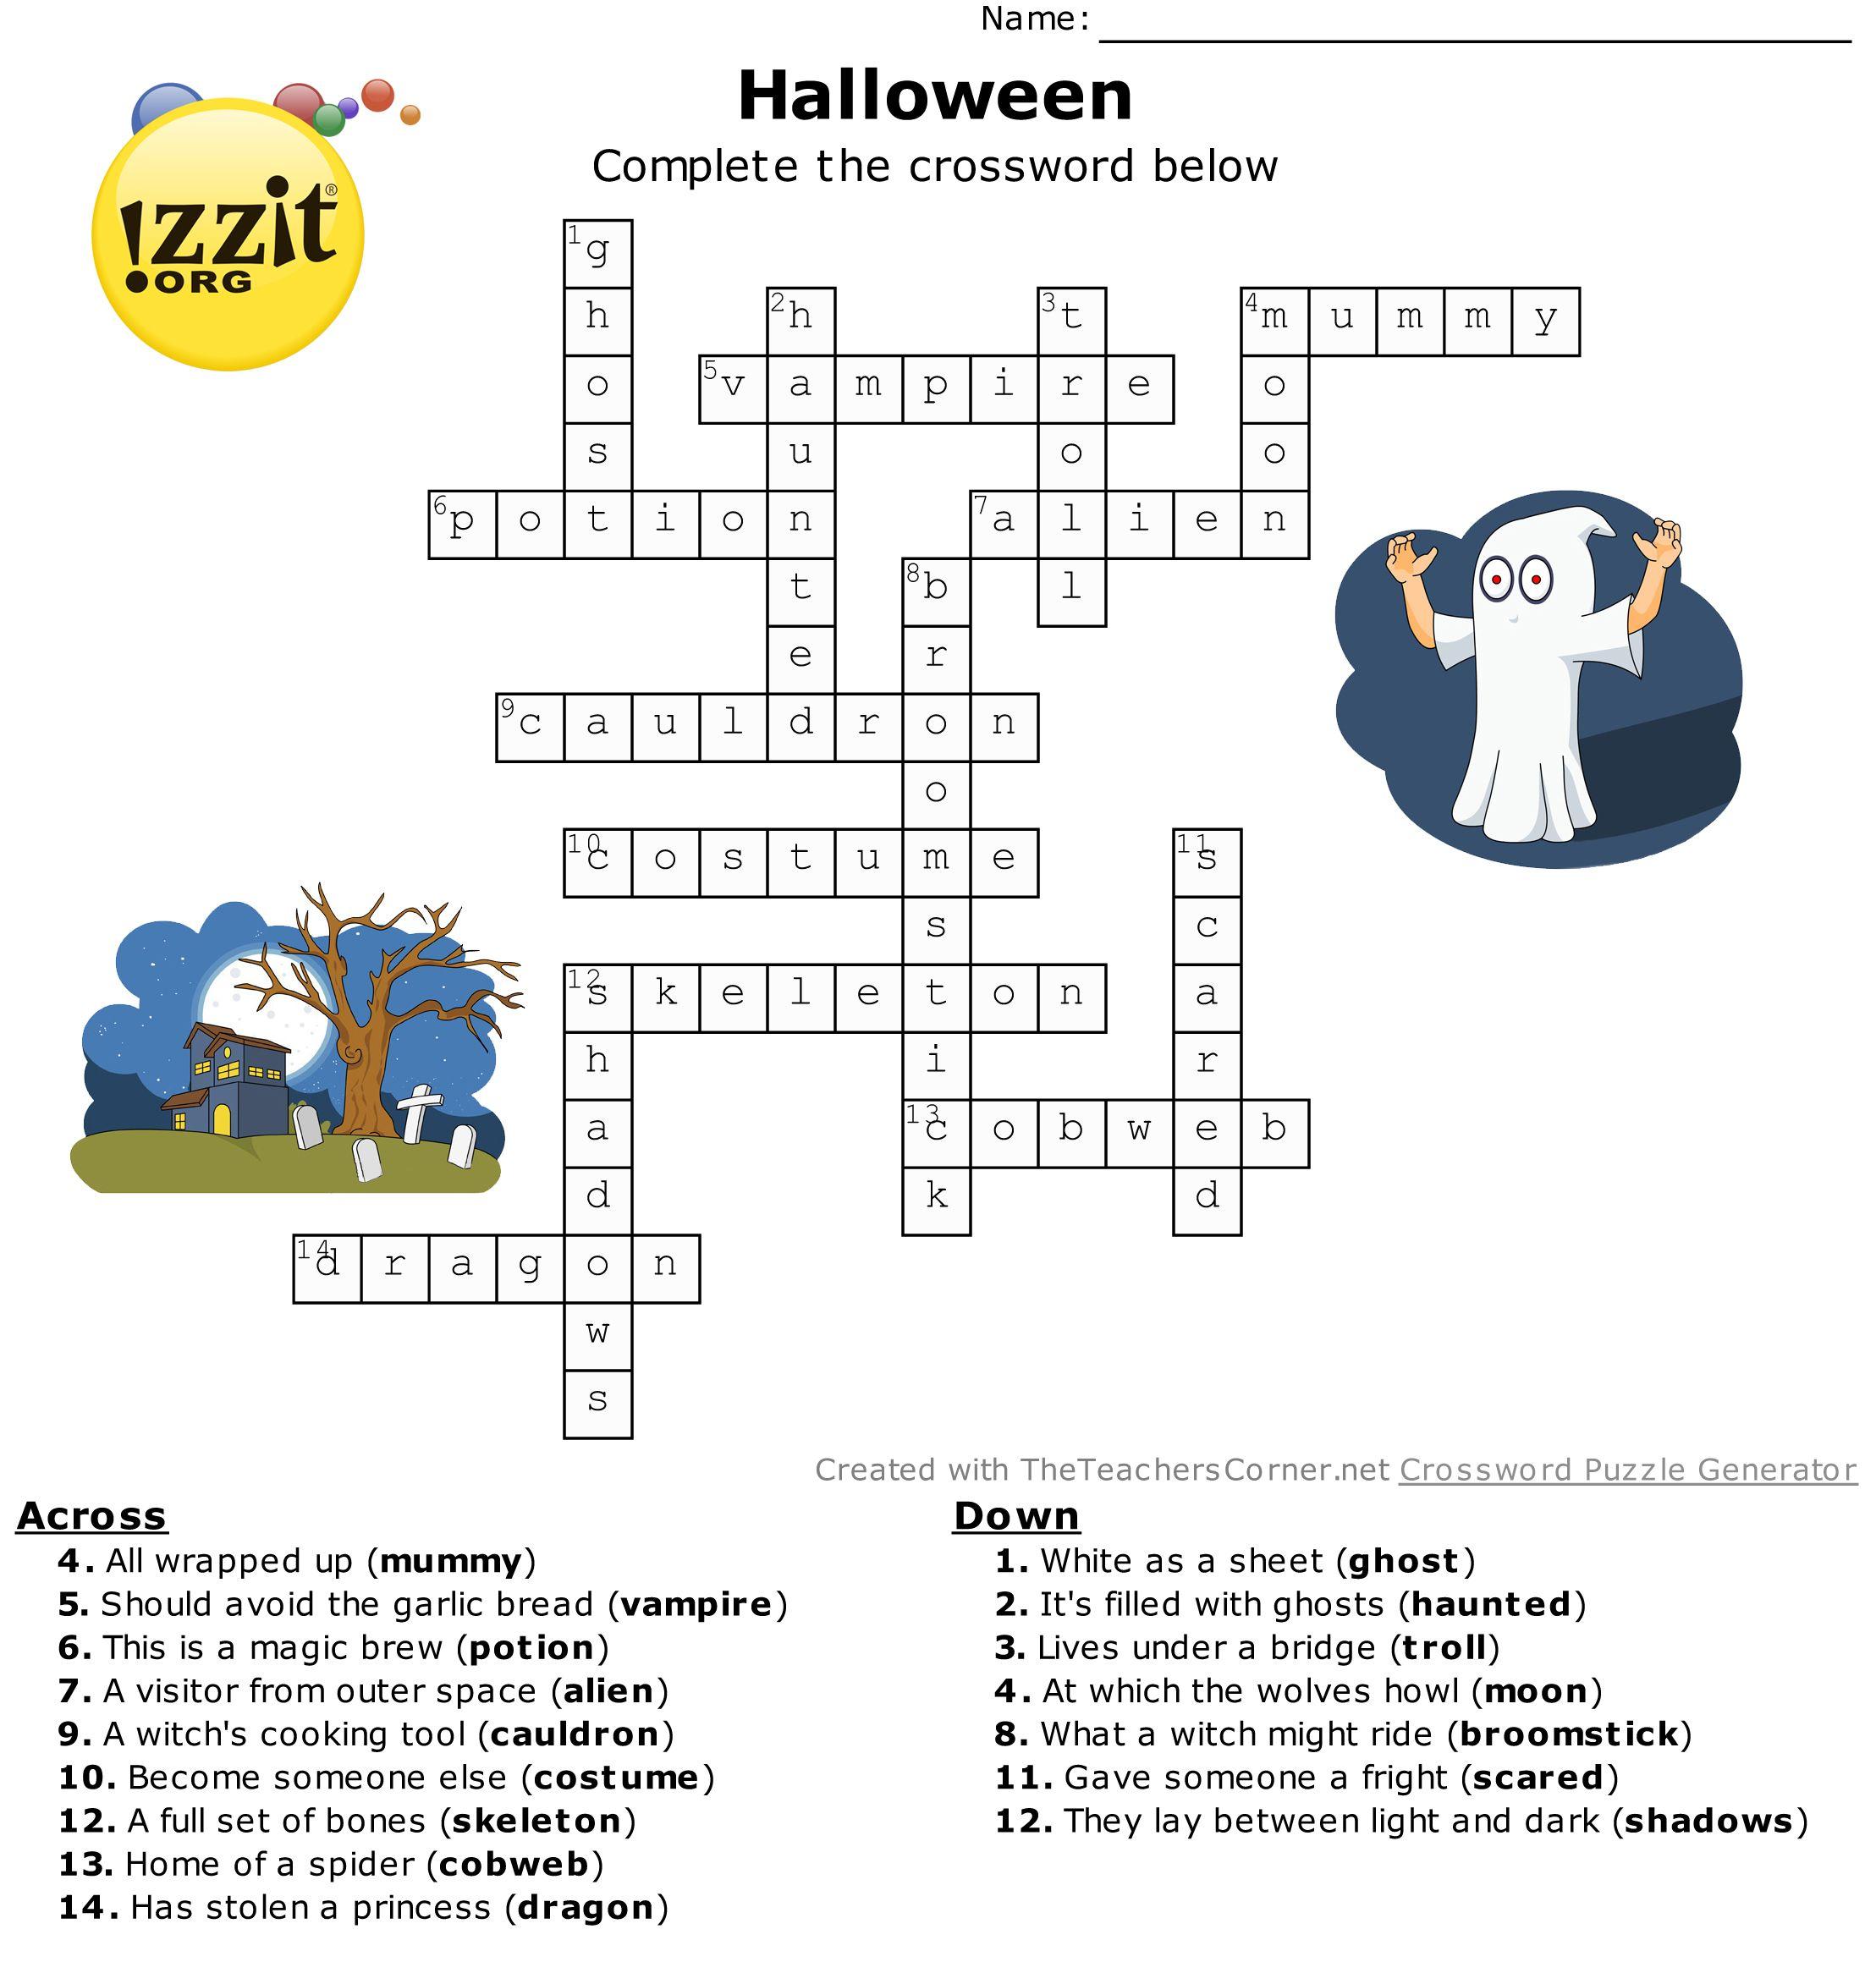 Halloween Crossword Answers - Hard #HappyHalloween ???  sc 1 st  Pinterest & Halloween Crossword Answers - Hard #HappyHalloween ... 25forcollege.com